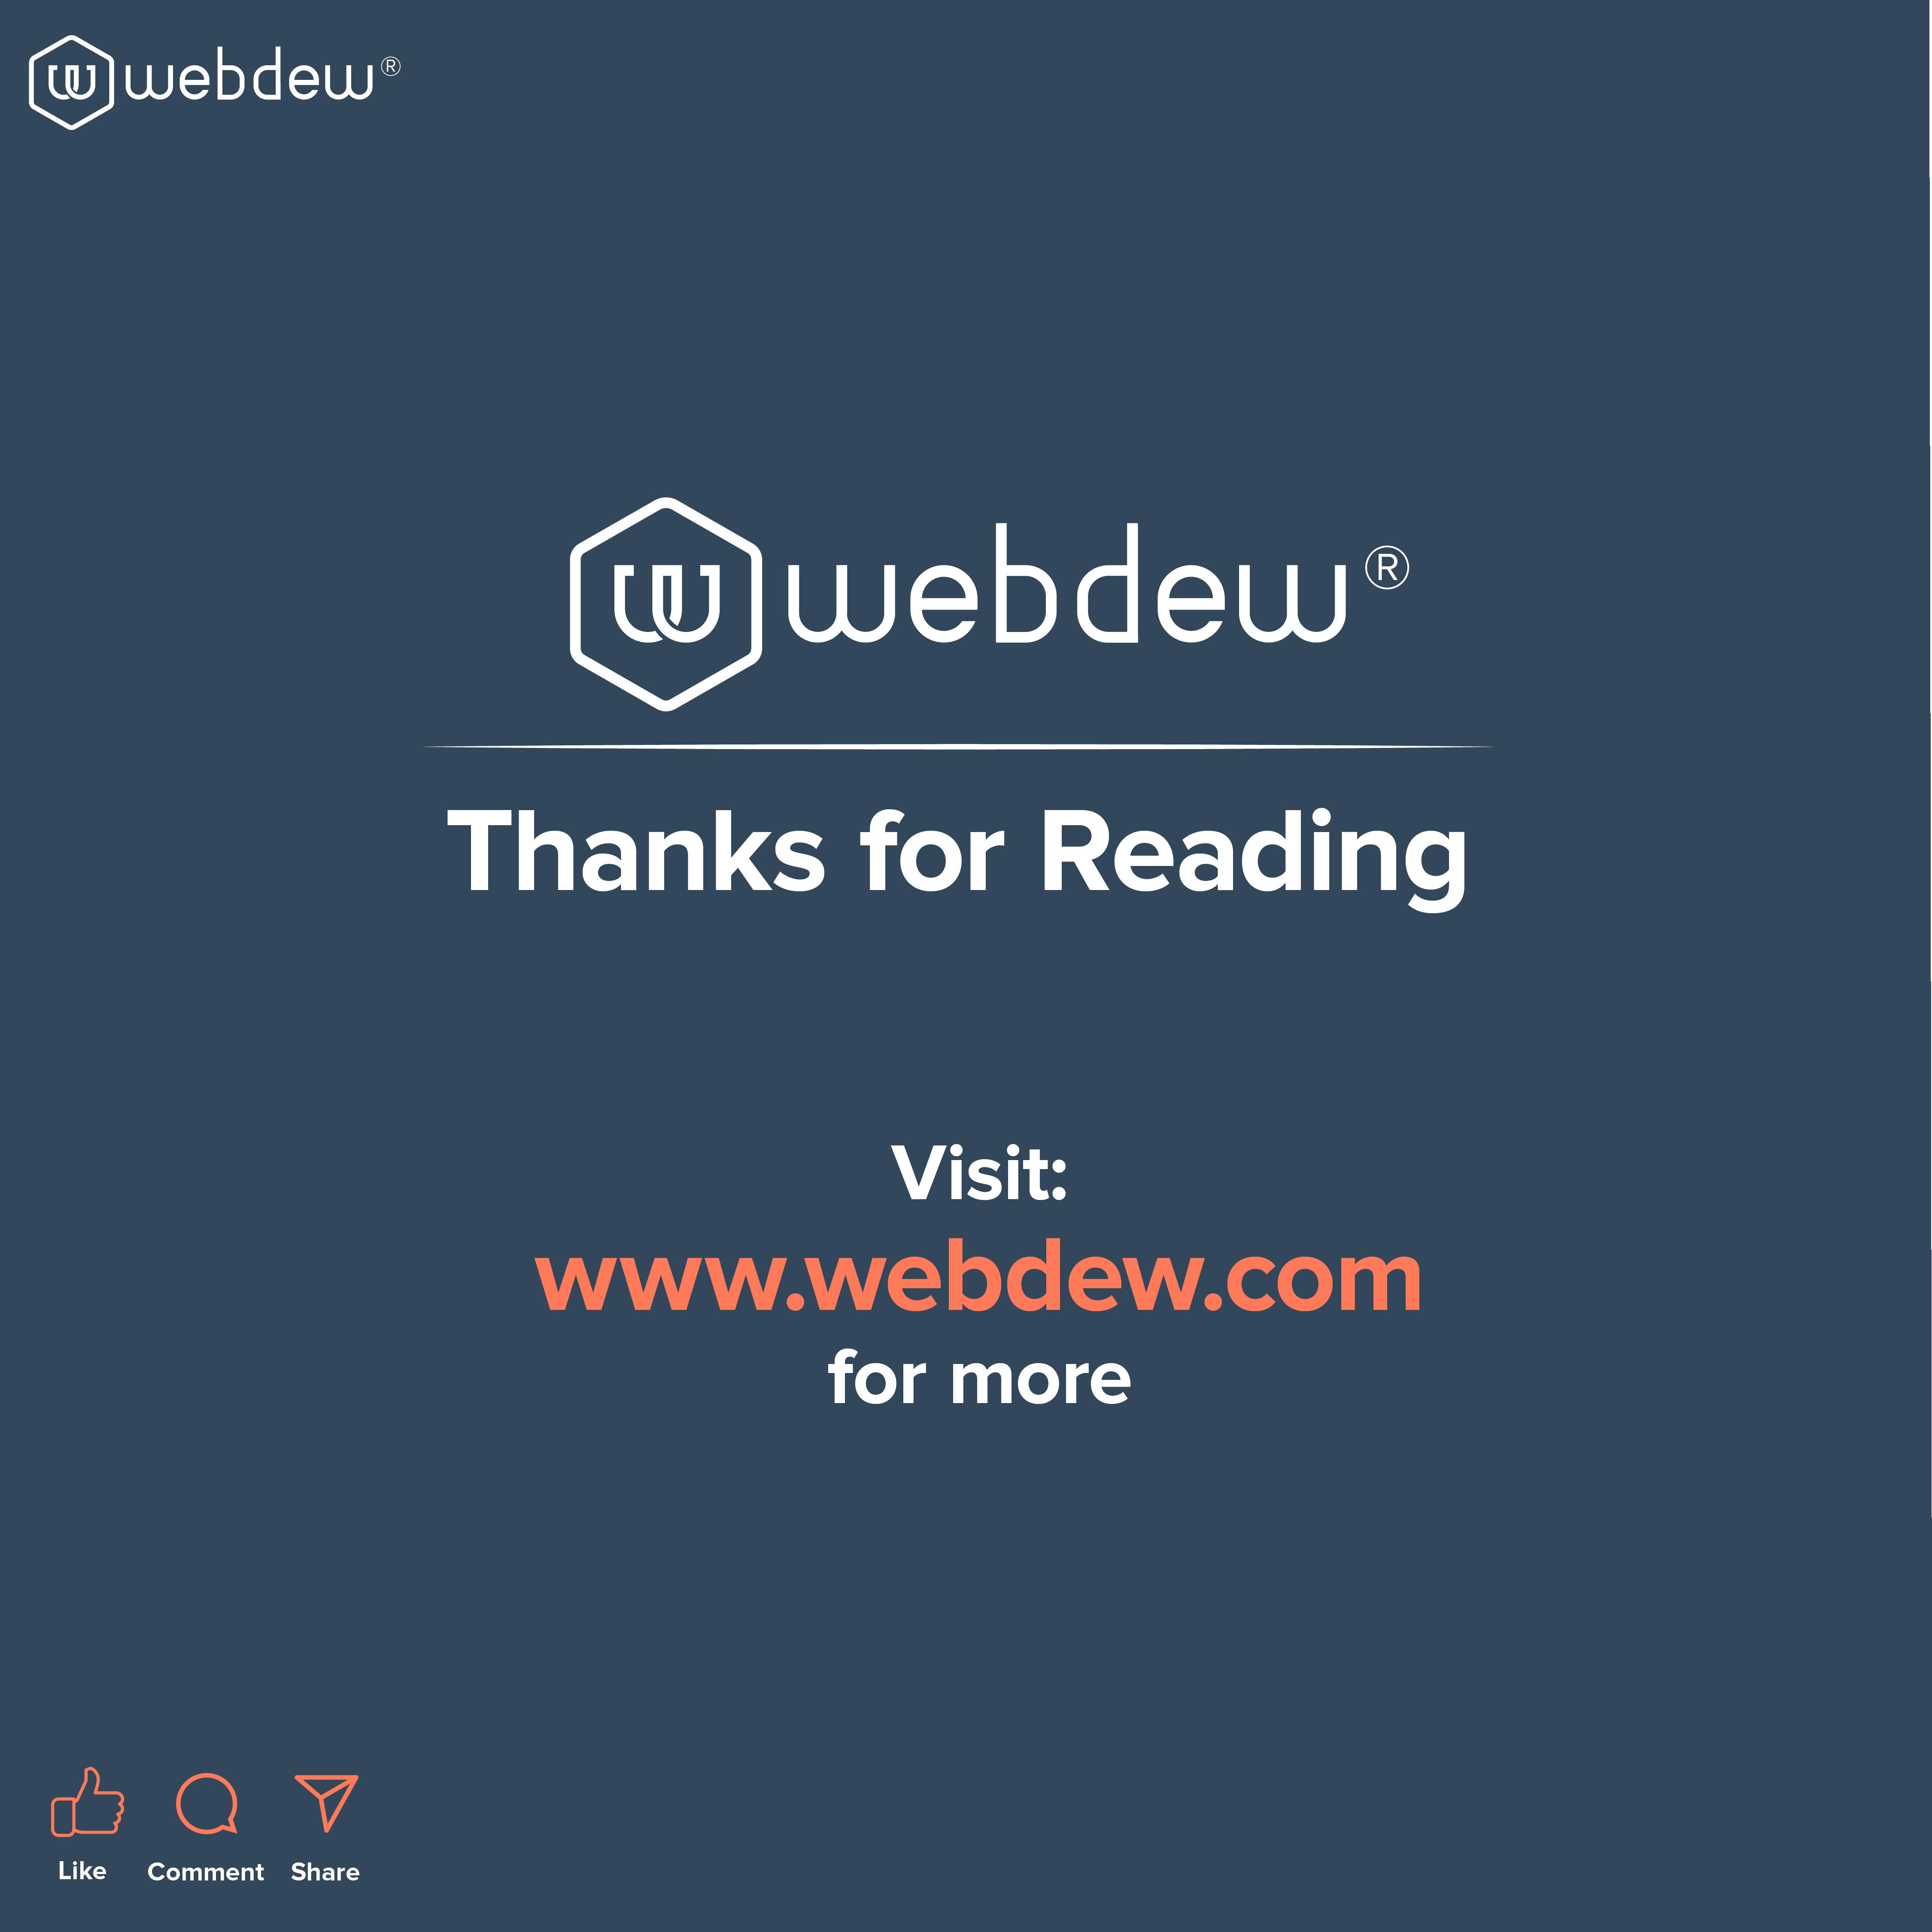 7. thanks for reading-3